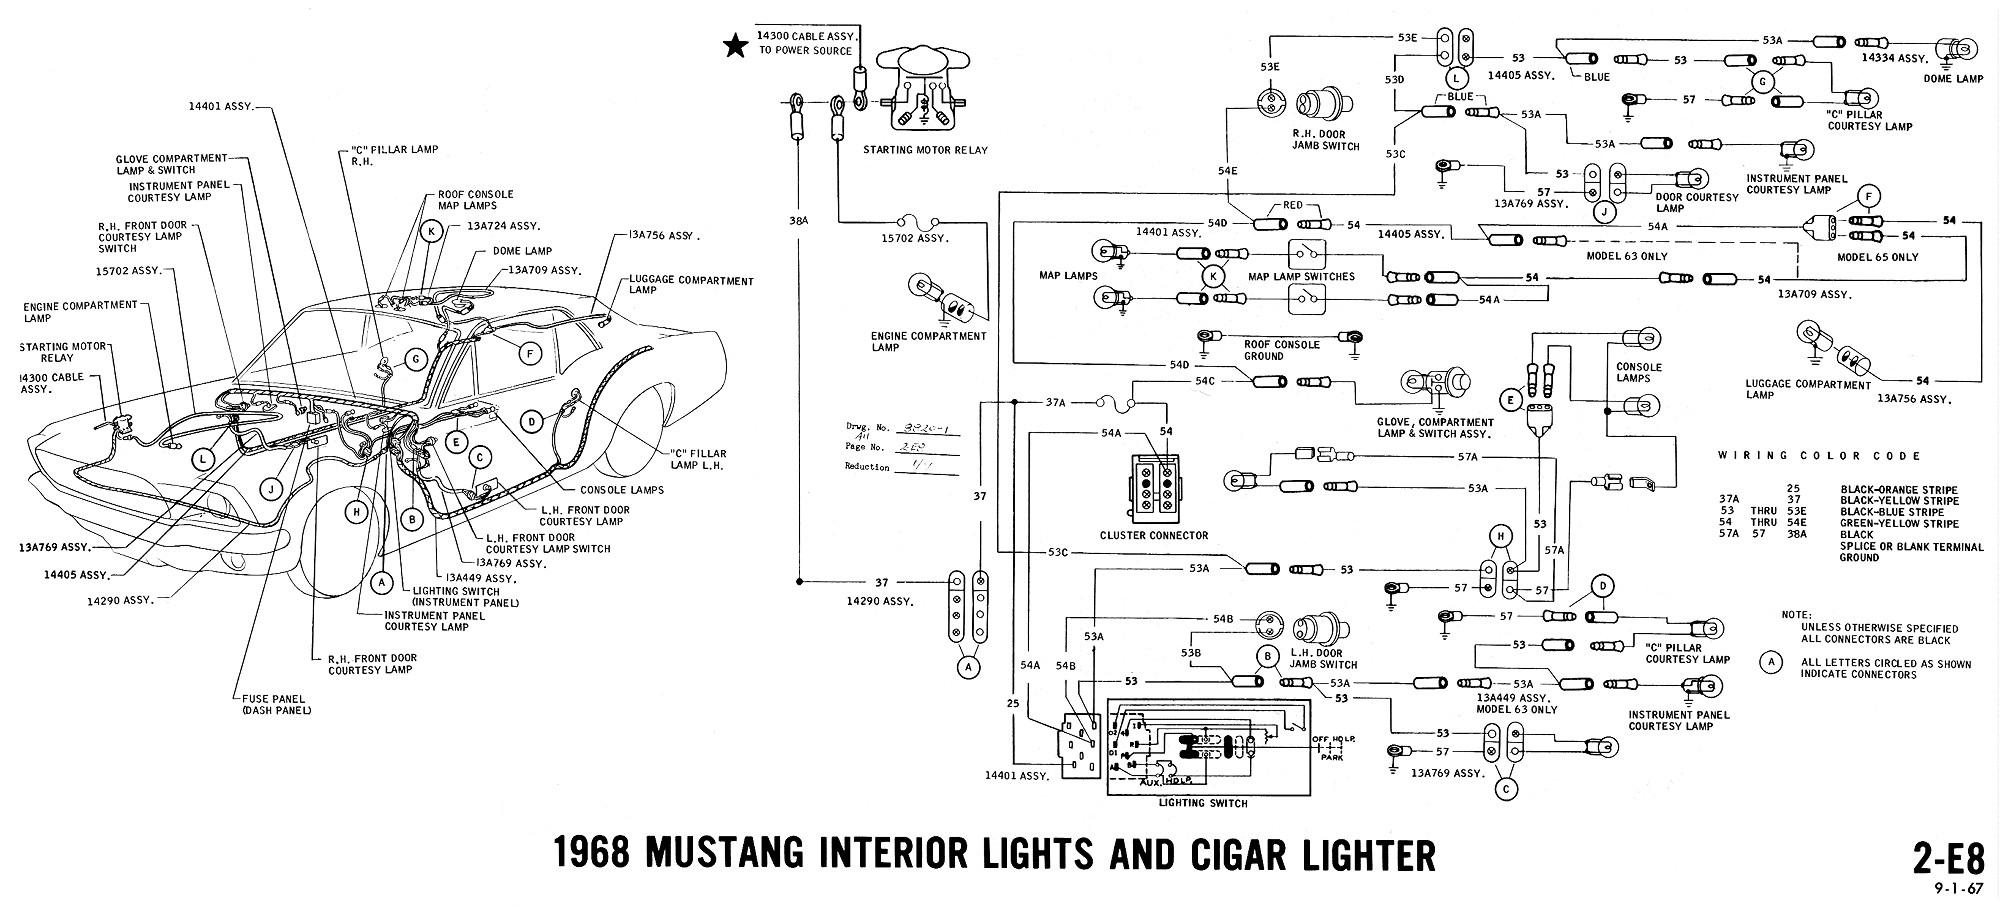 2001 pontiac firebird suspension diagram